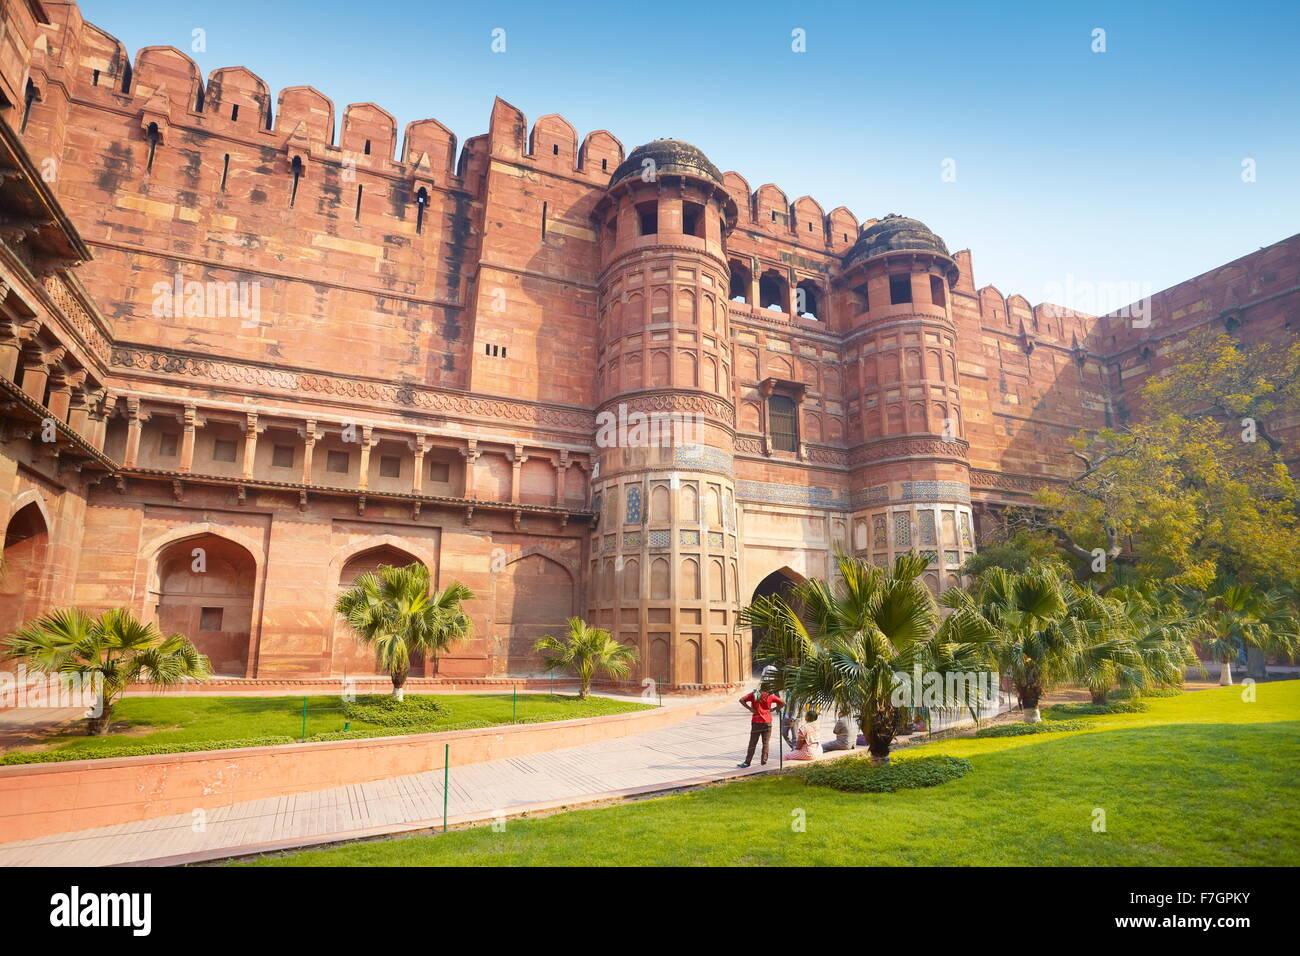 Agra Red Fort - Amar Singh Gate, befestigten Haupttor, Agra, Indien Stockbild